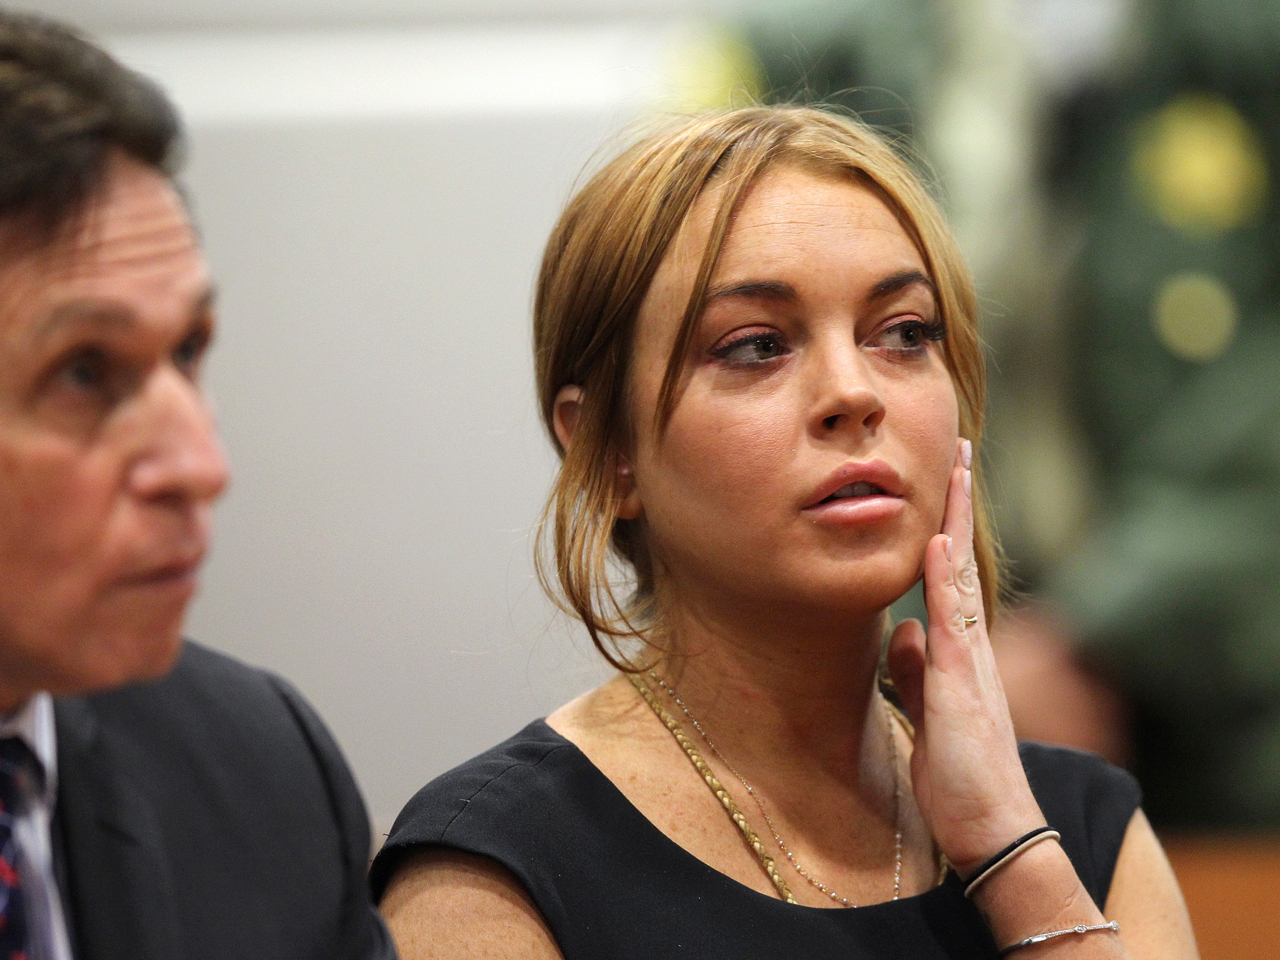 Lindsay Lohans Movie Producer Friend Keith Middlebrook